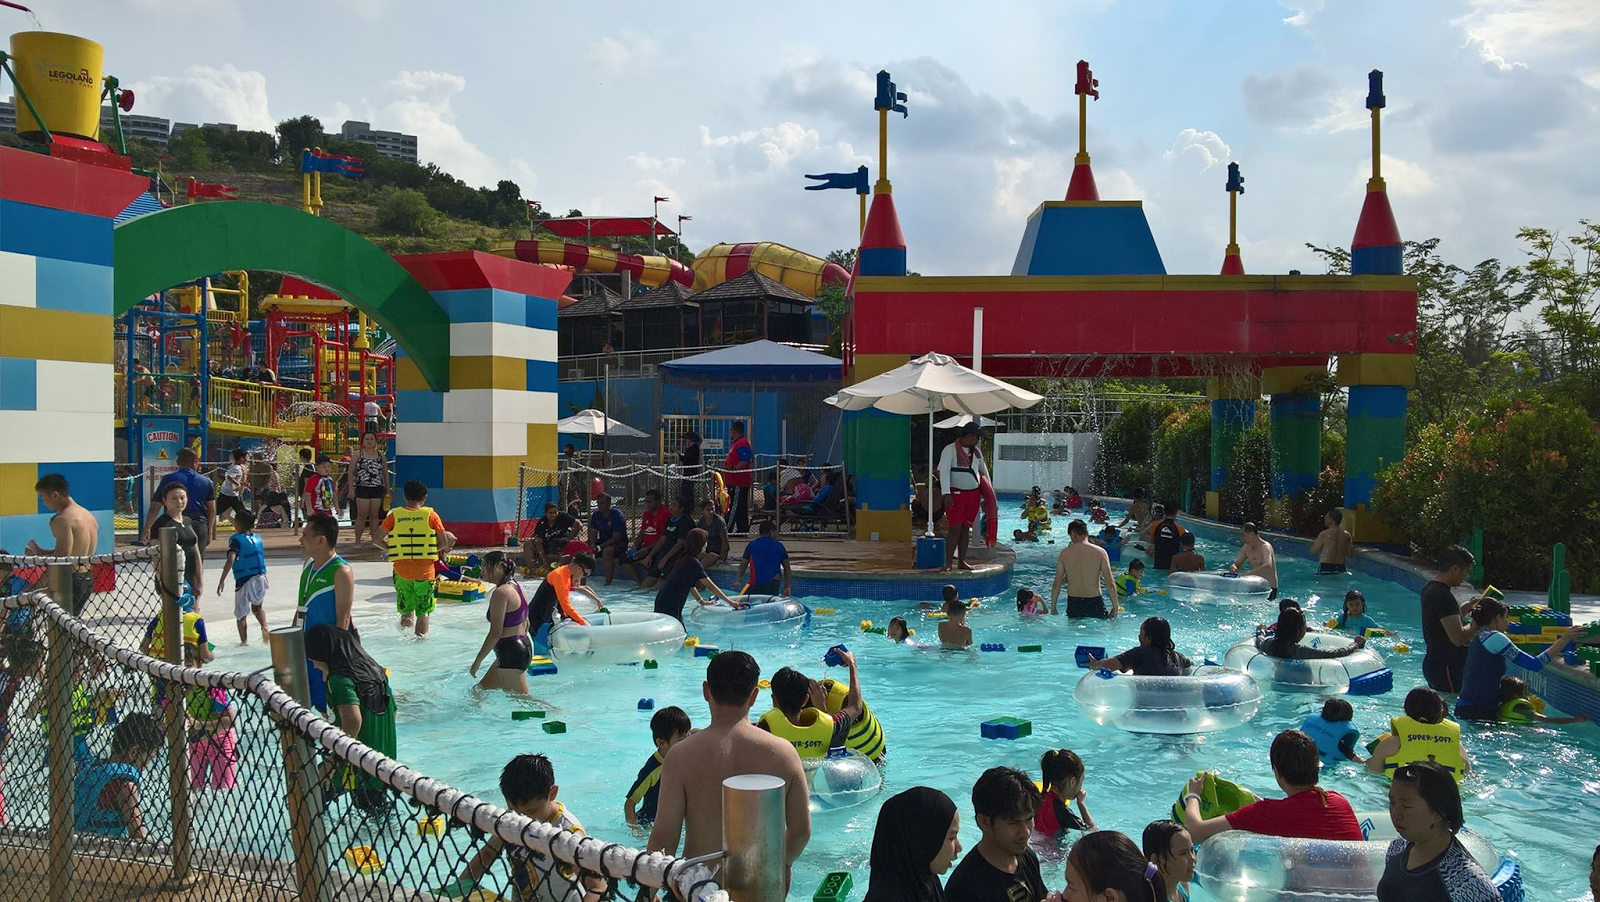 Makchic Reviews: Legoland Malaysia